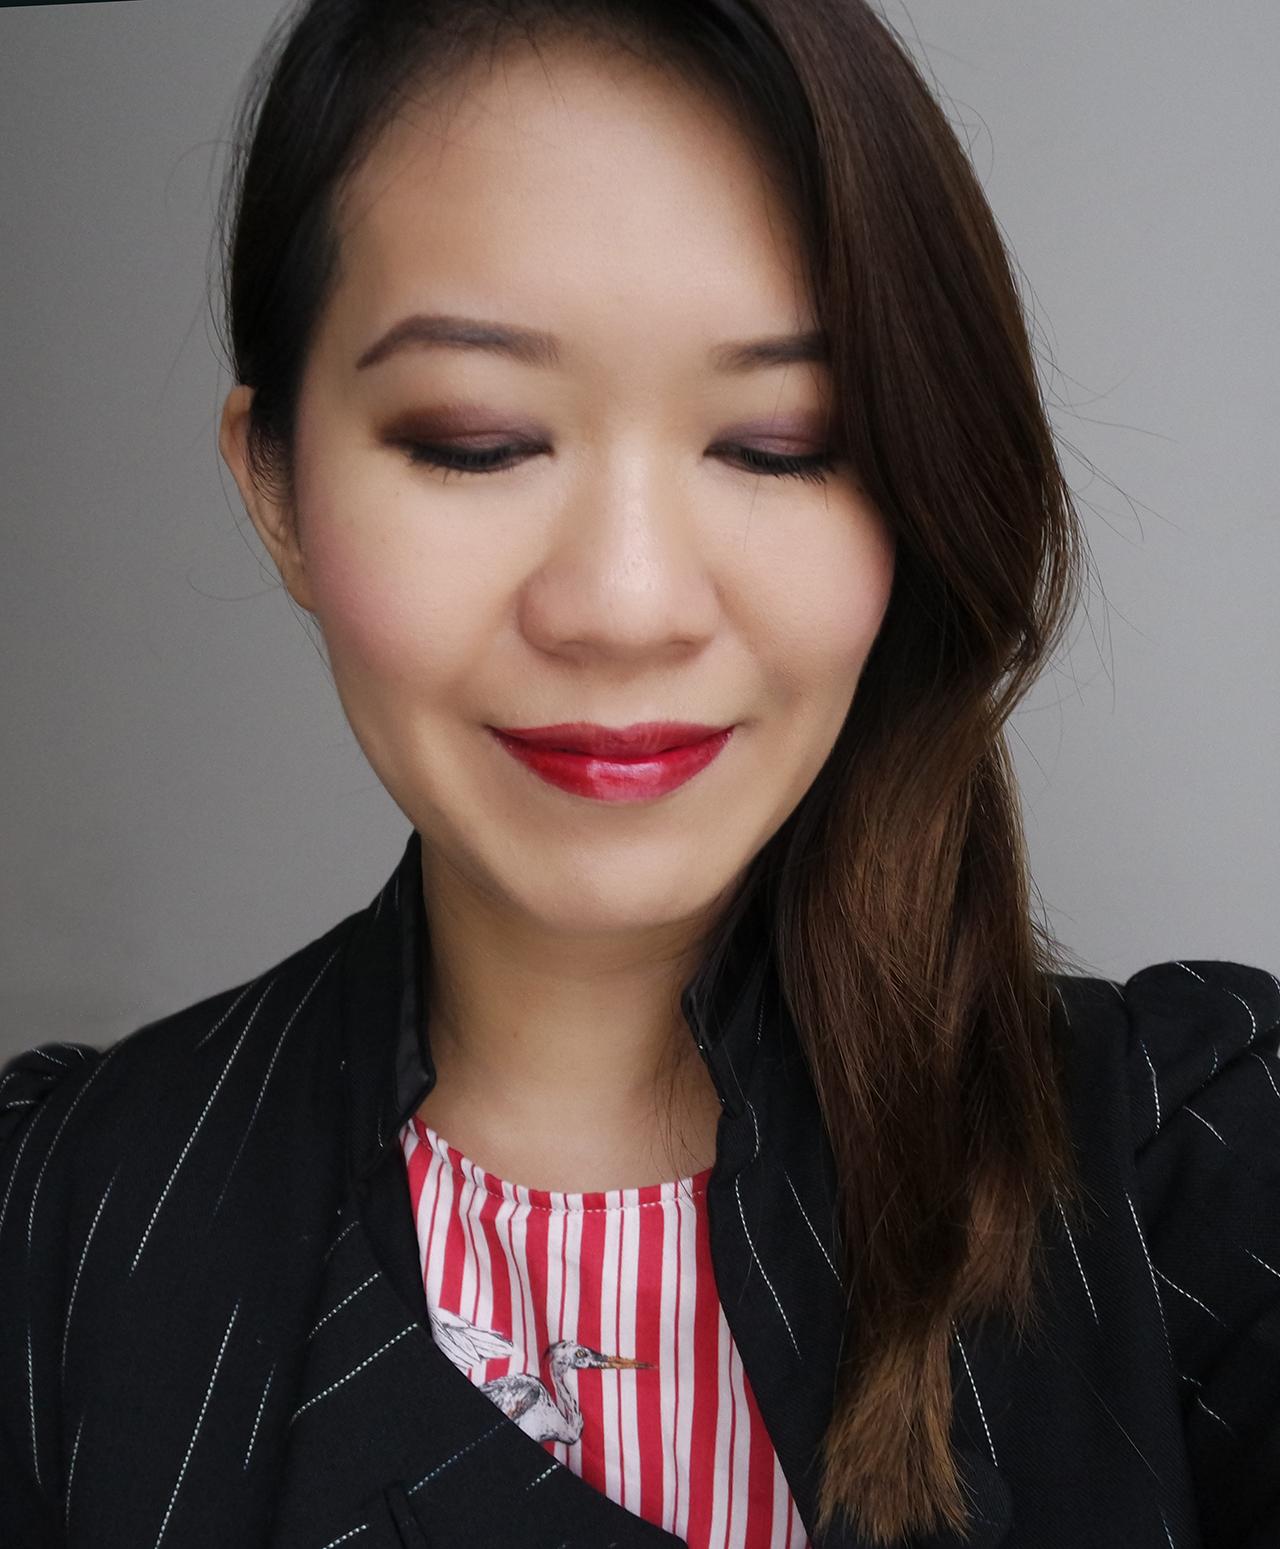 YSL Vernis à Lèvres makeup look